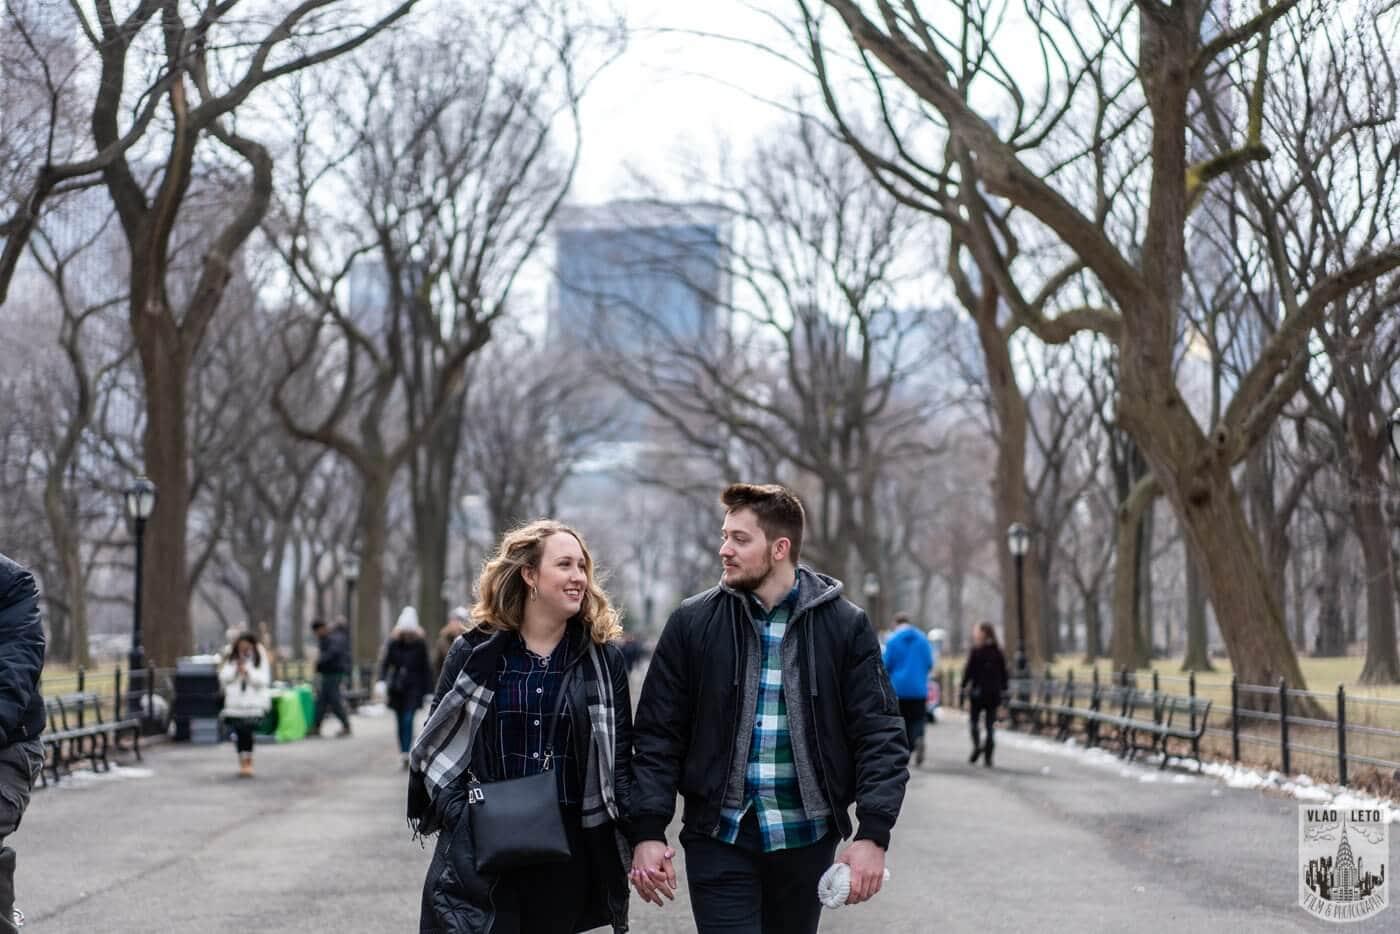 Photo 4 Bow bridge wedding proposal in Central Park   VladLeto